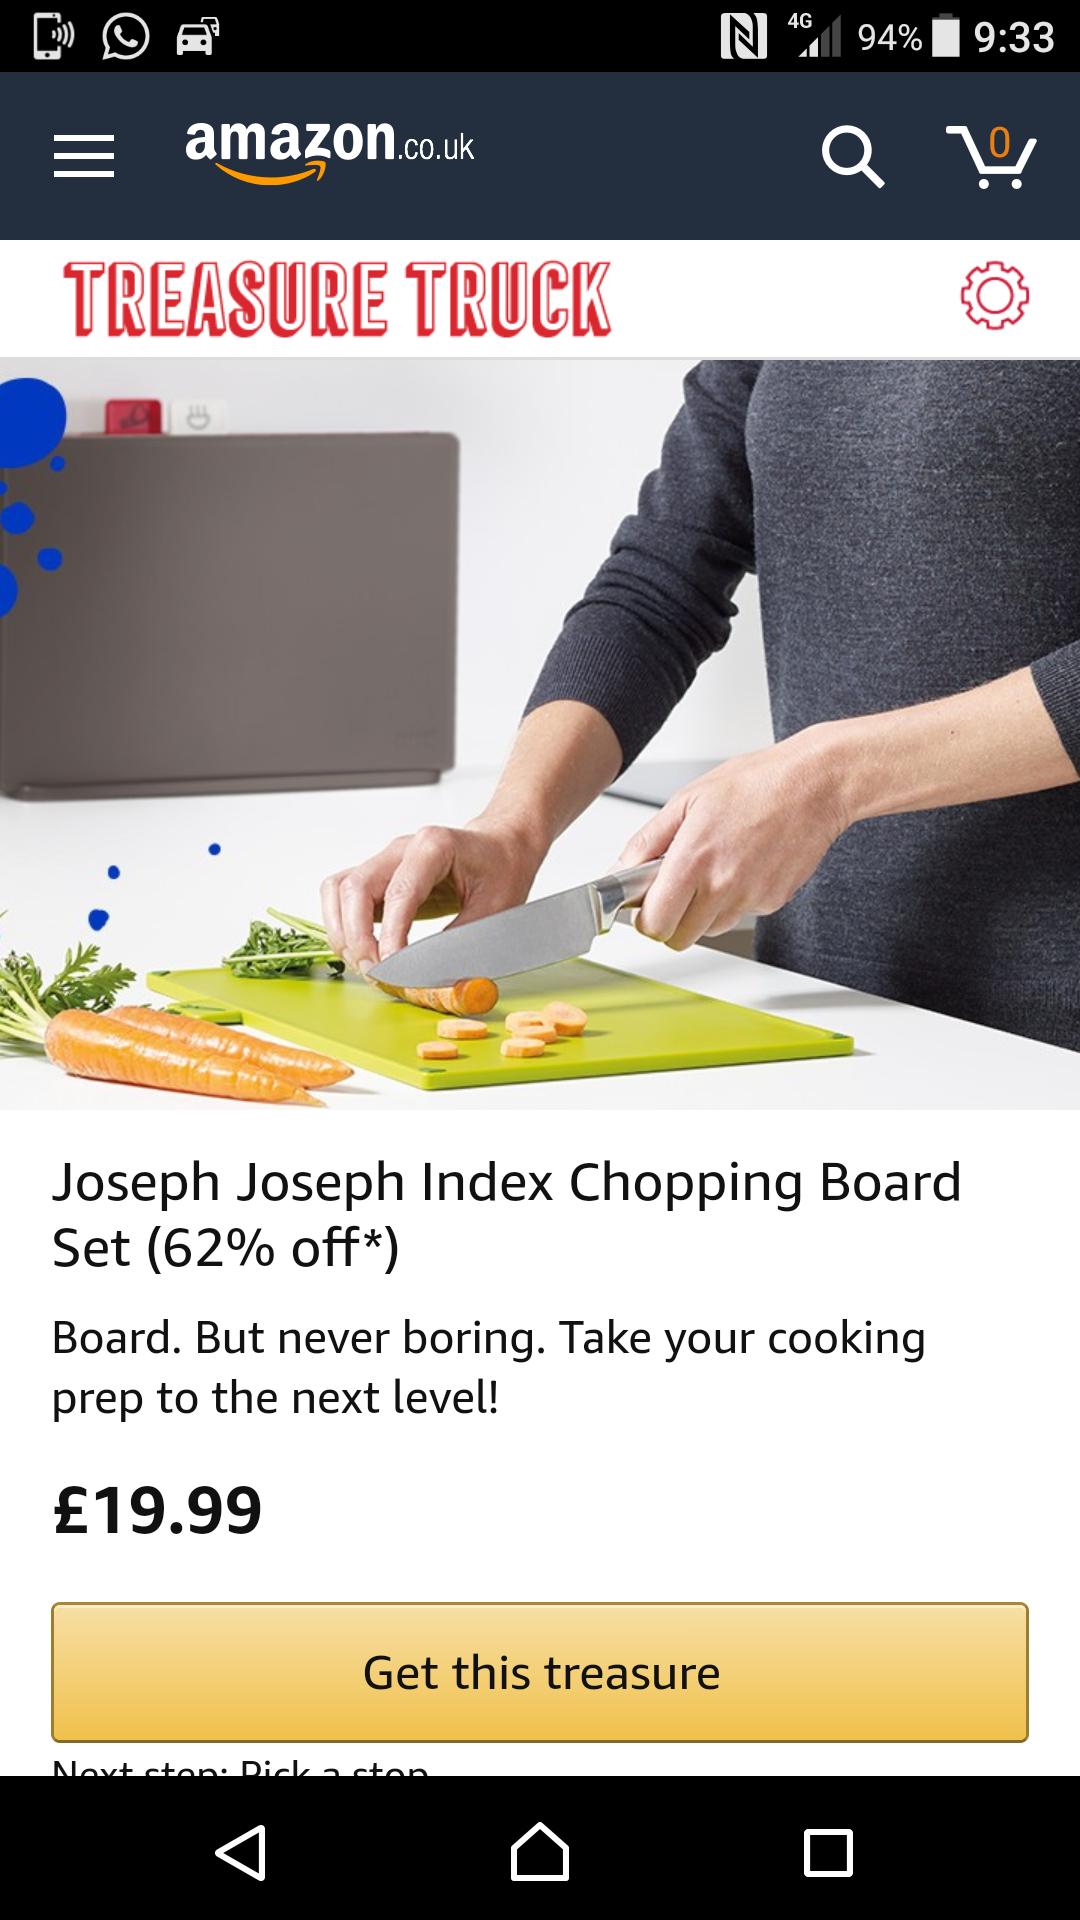 Set of Joseph Joseph chopping boards £19.99 via Amazon treasure truck